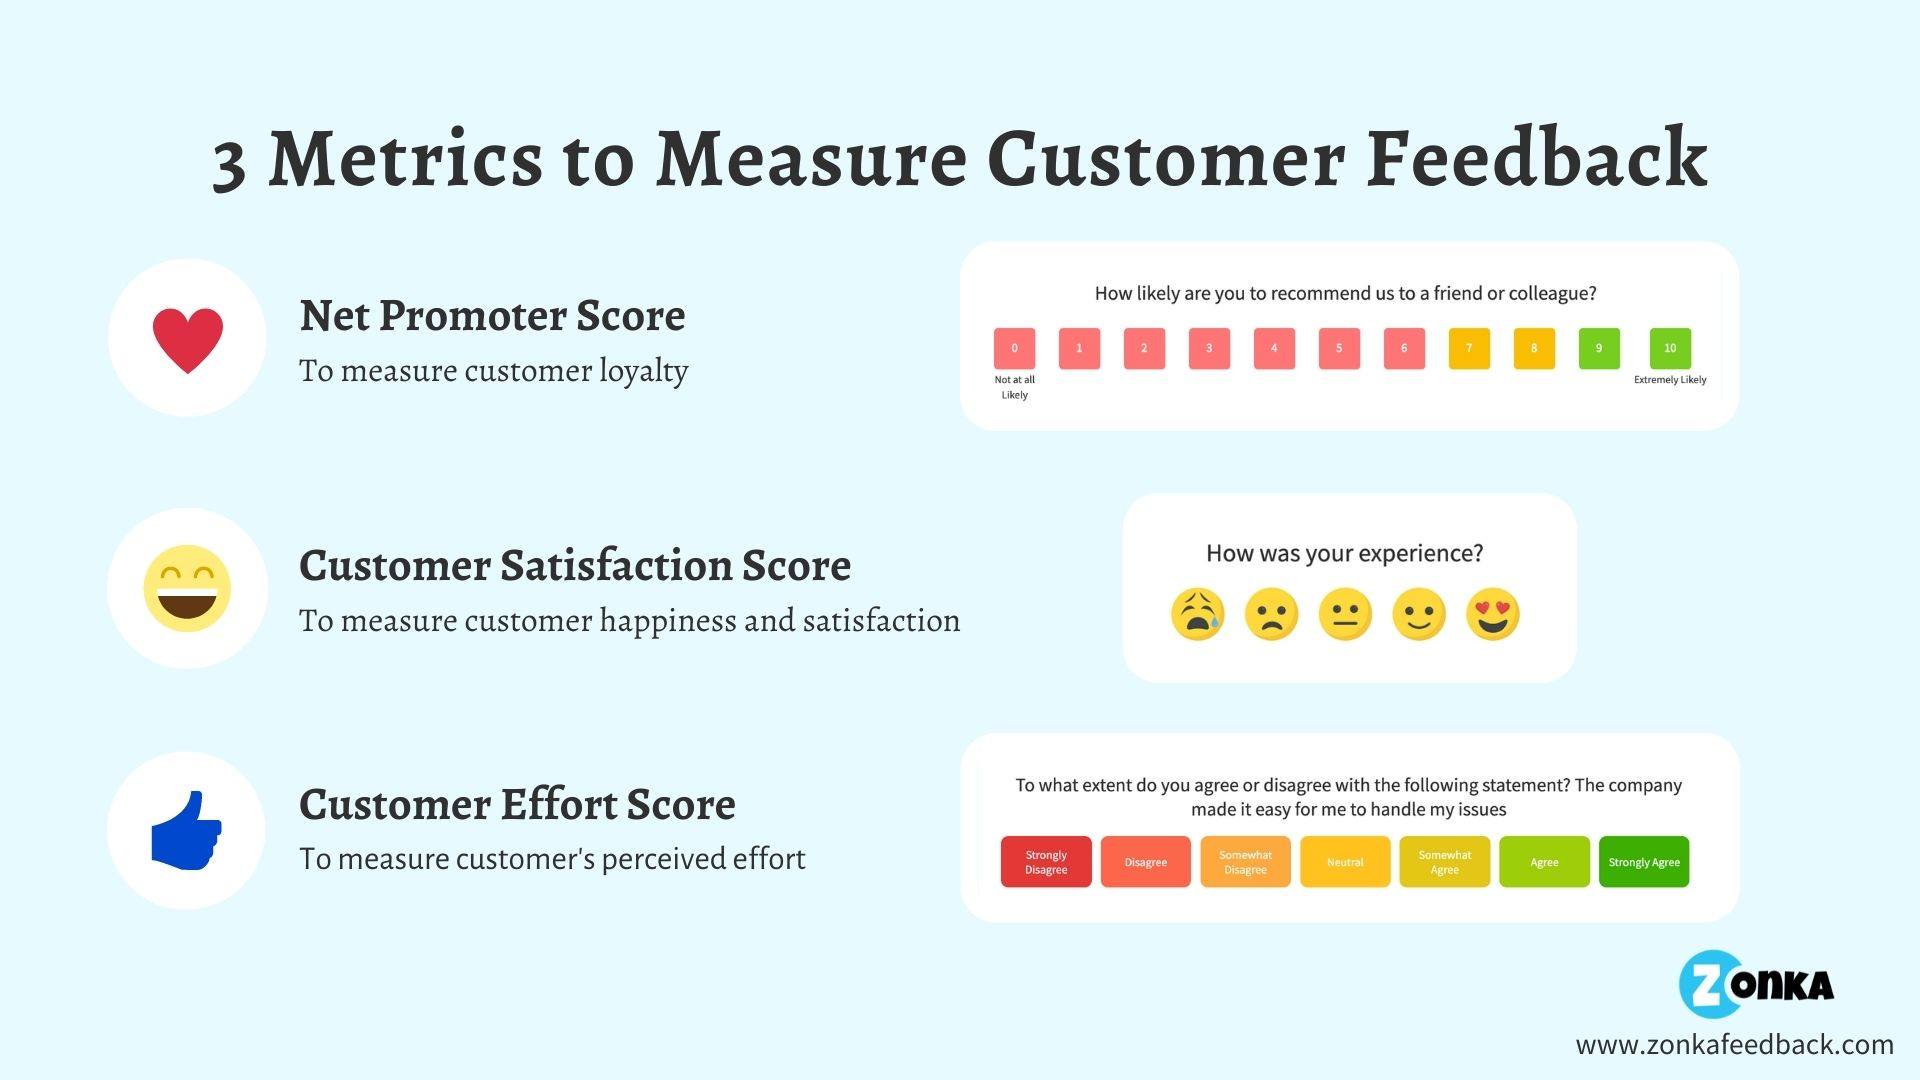 Metrics to Measure Customer Feedback